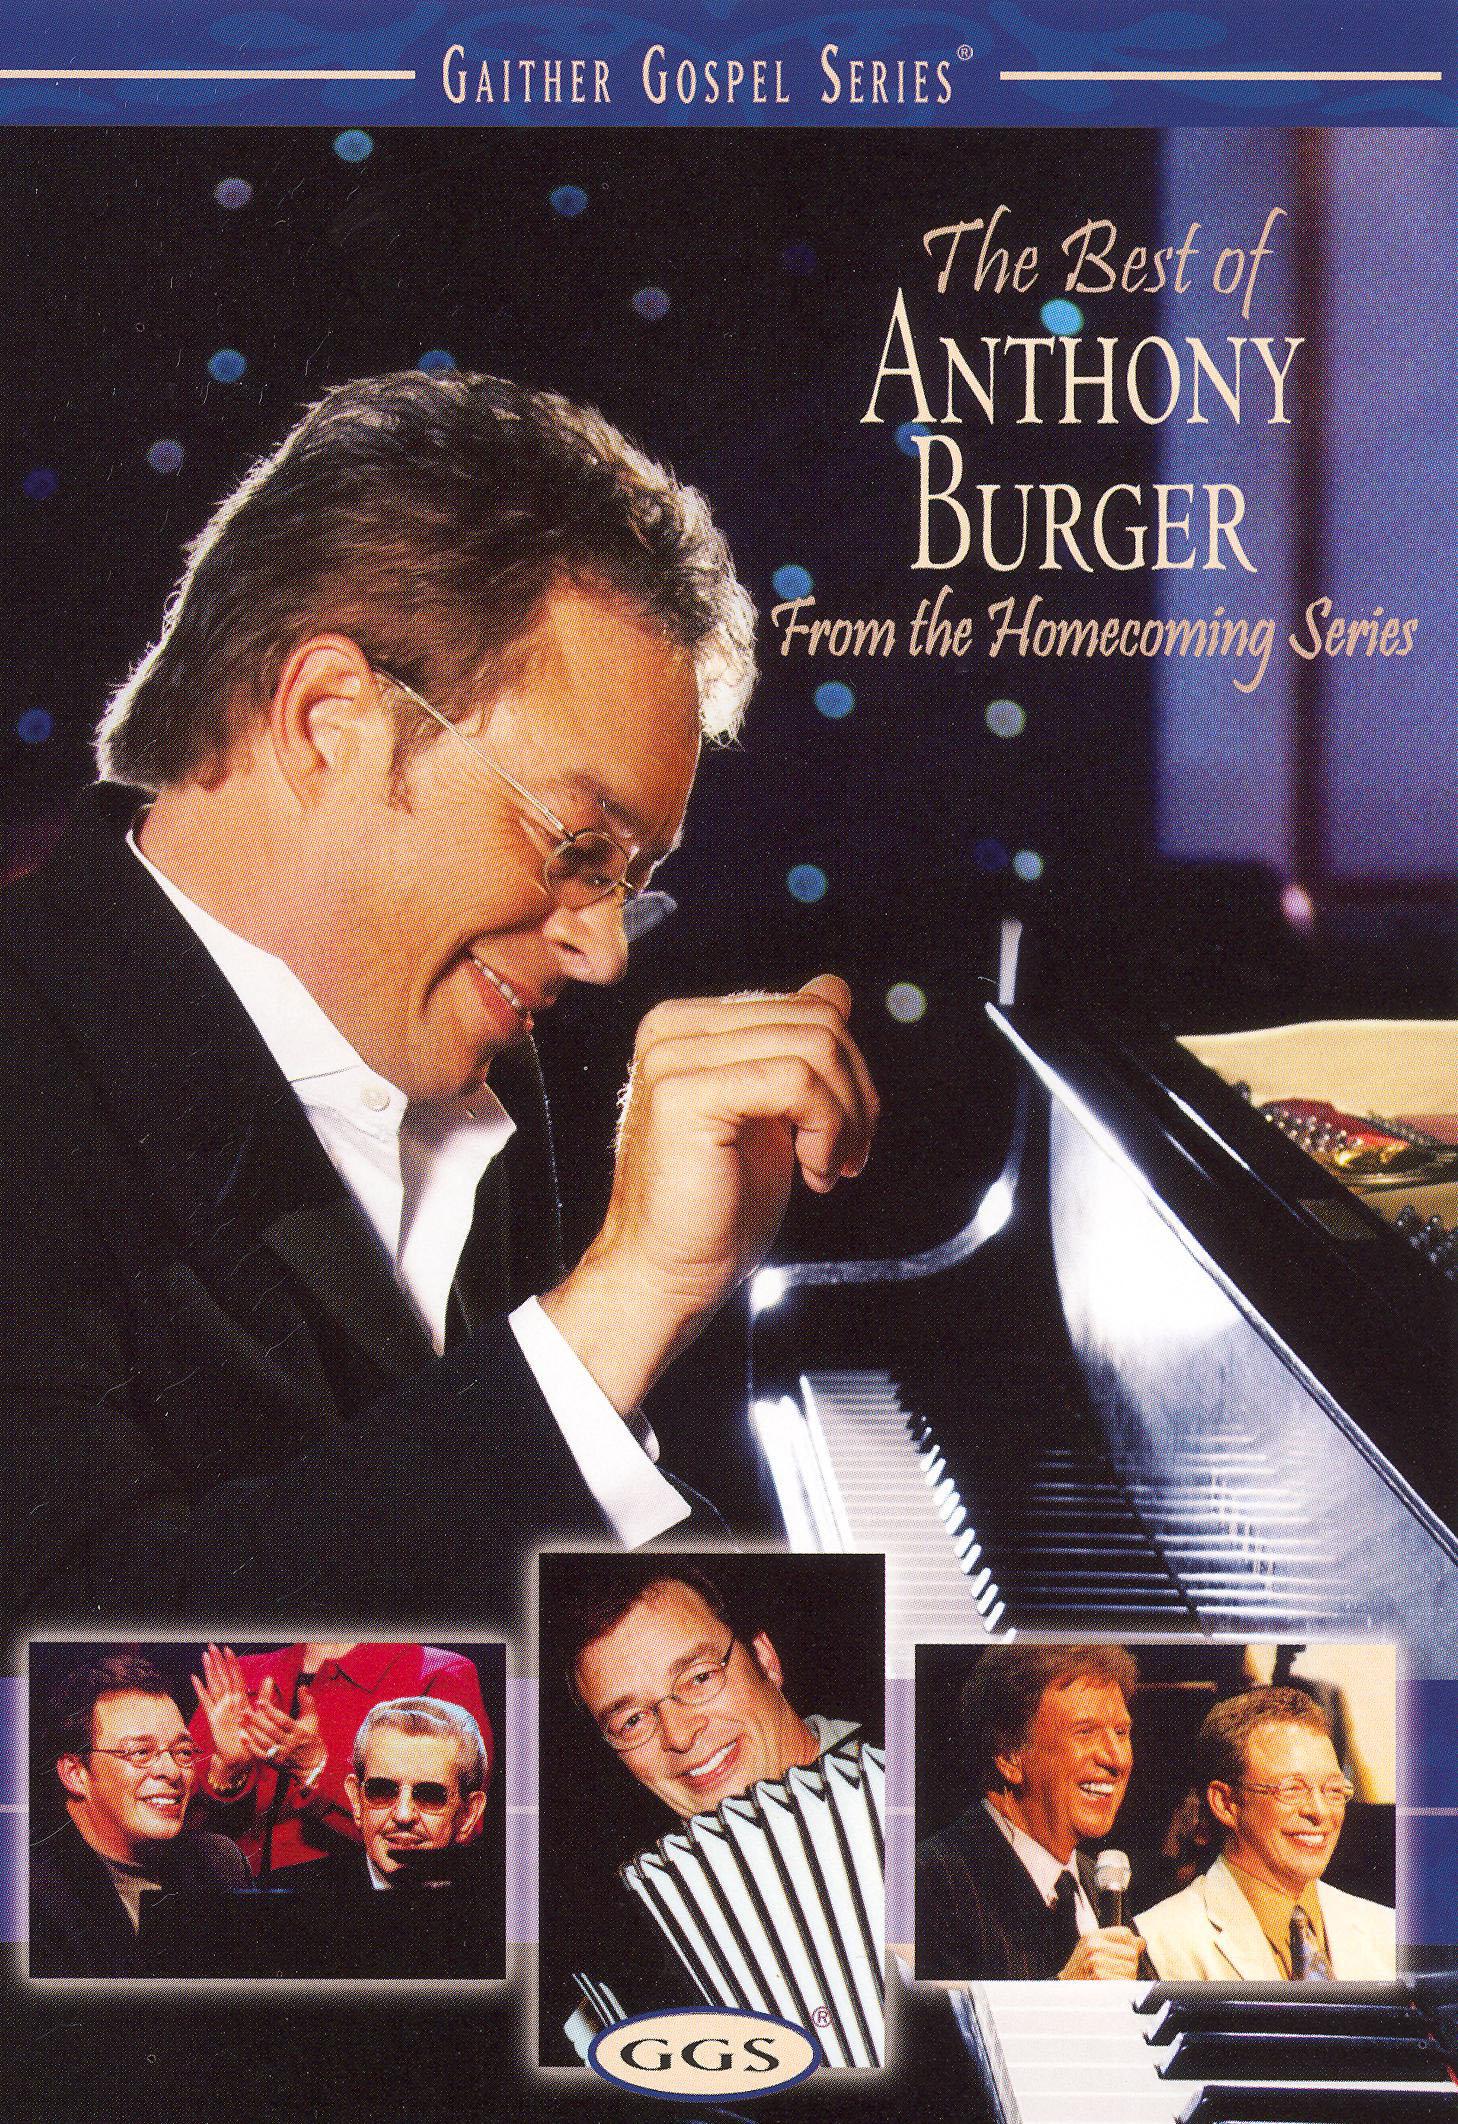 Anthony Burger: The Best of Anthony Burger